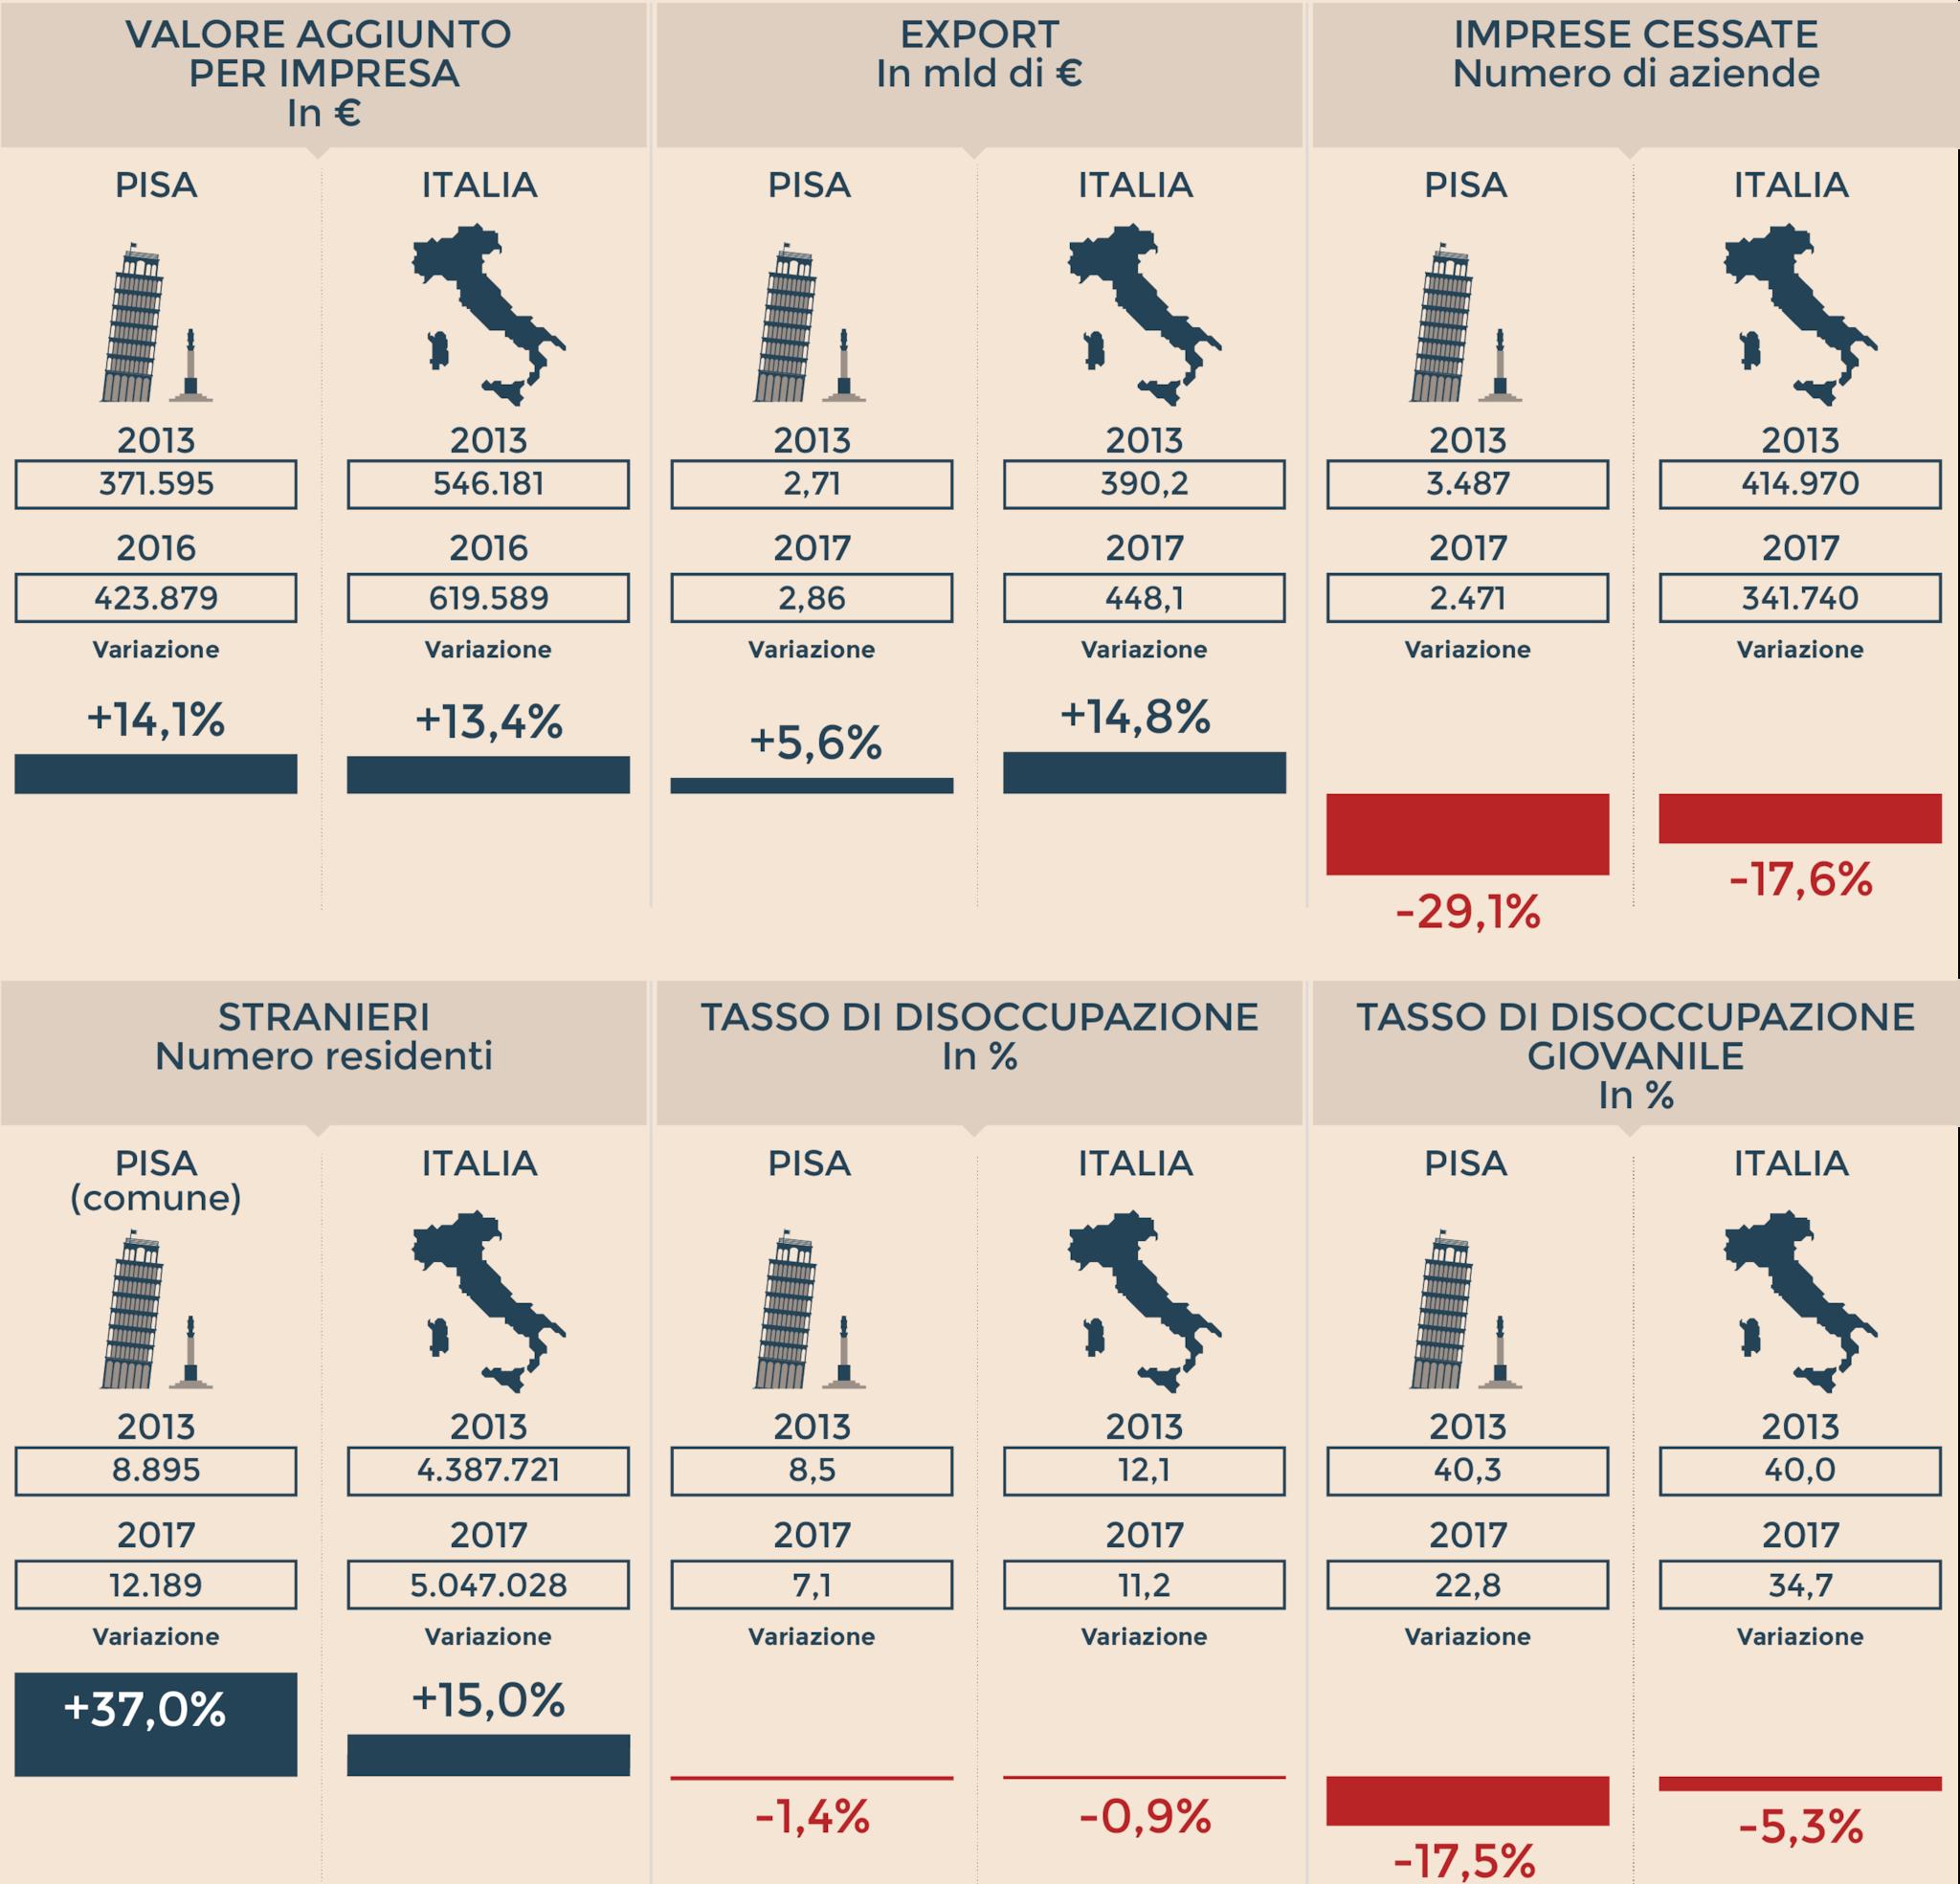 L'IDENTIKIT ECONOMICO DI PISA